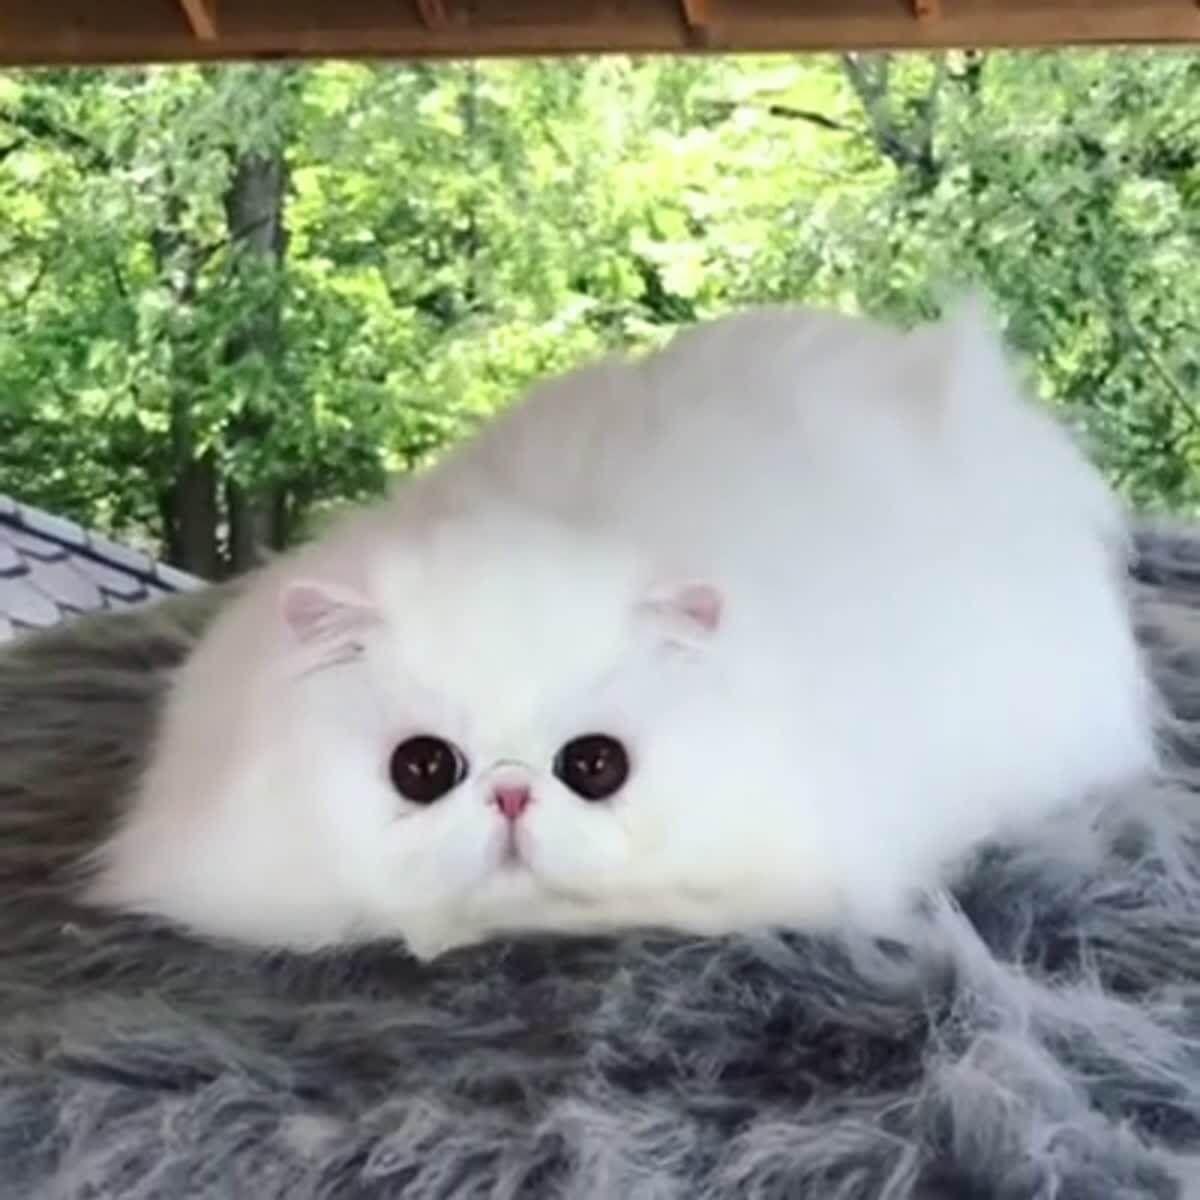 97% fluff, 3% eyes - LolSnaps